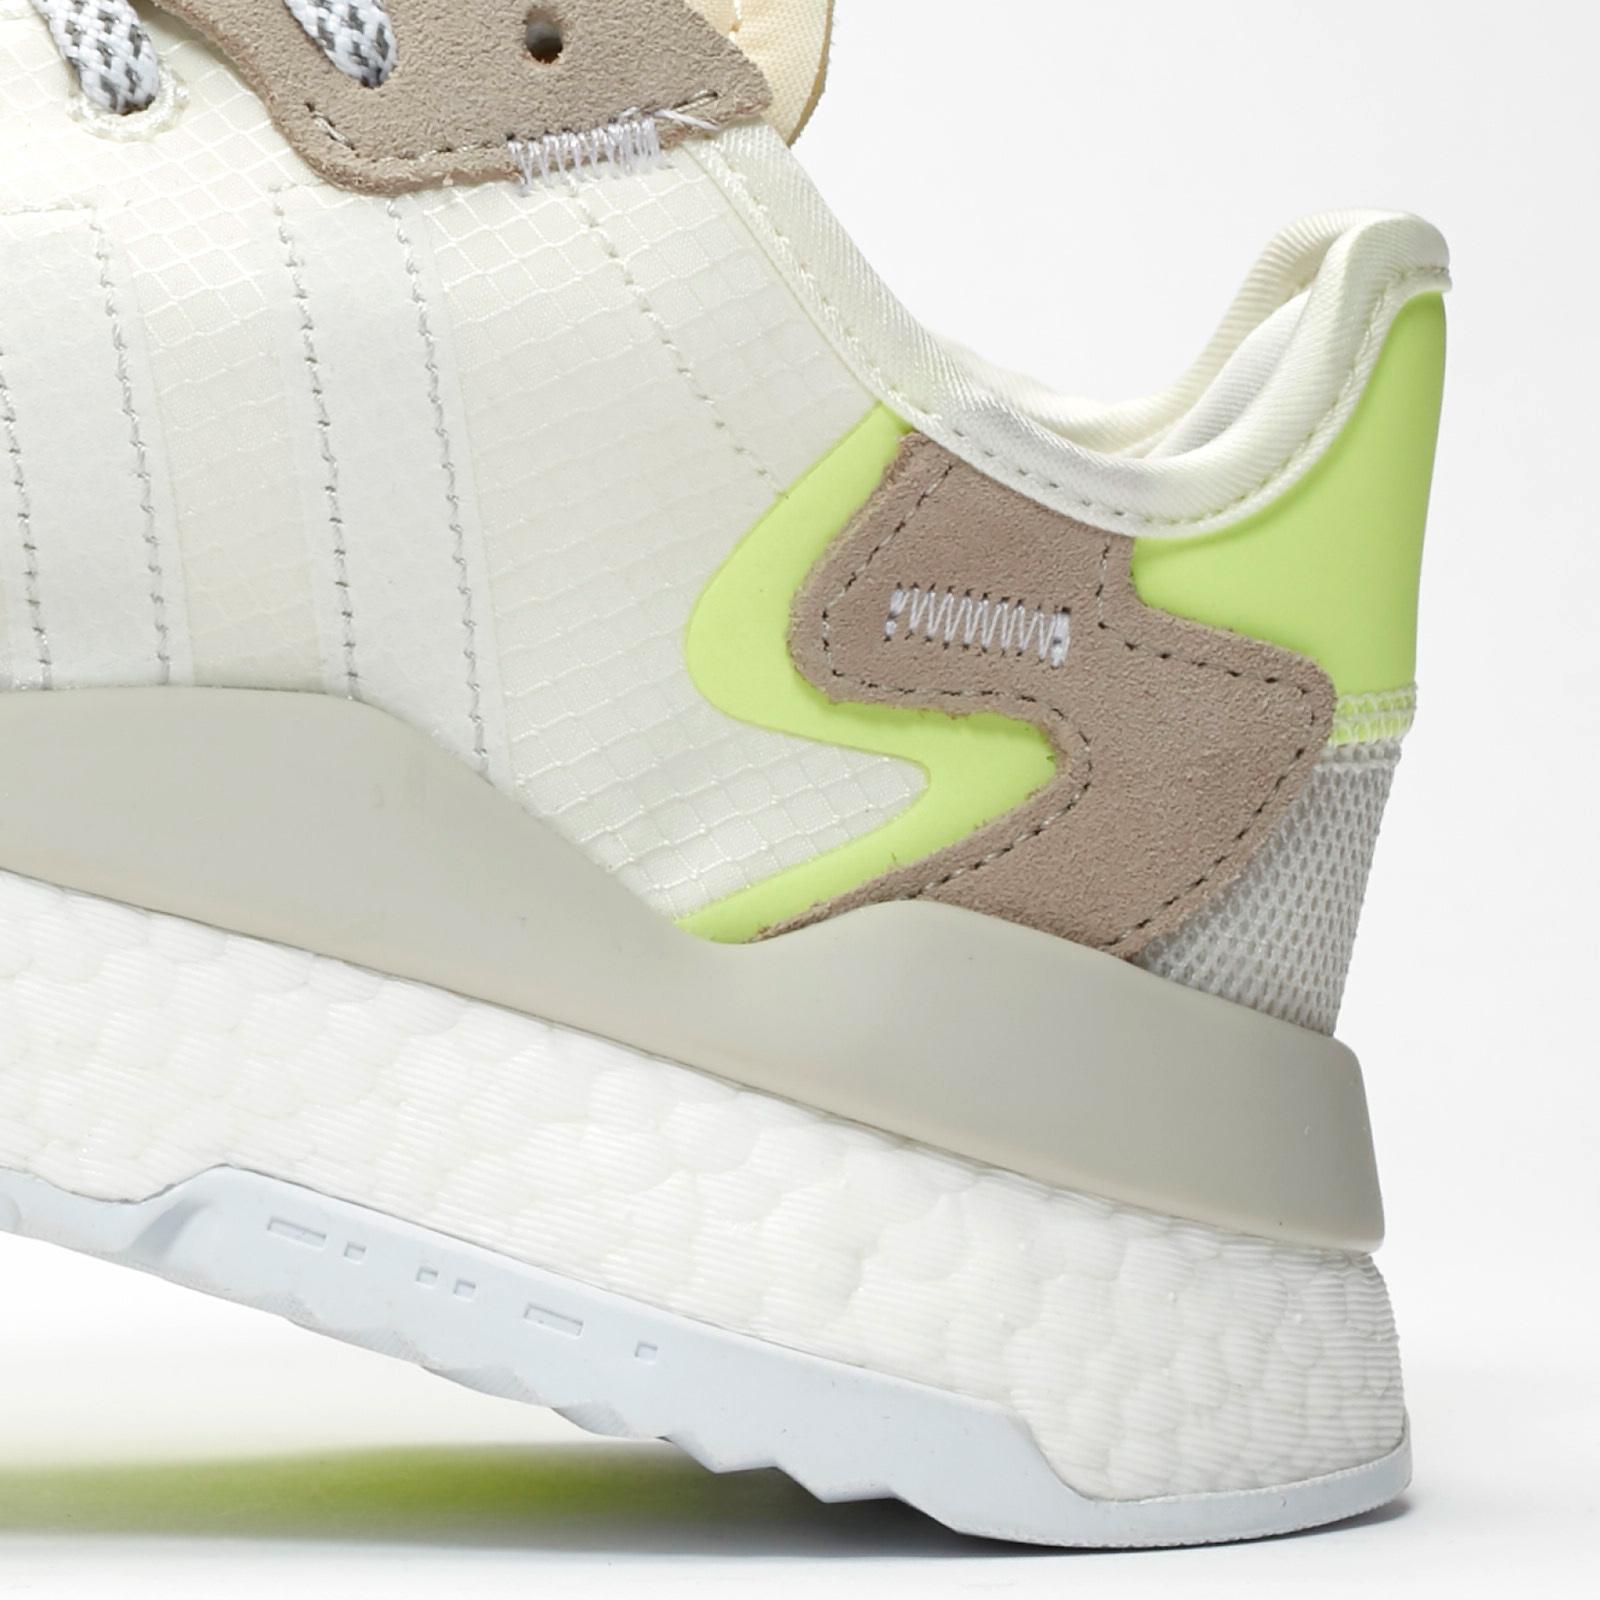 adidas Nite Jogger W Cg6098 Sneakersnstuff I Sneakers